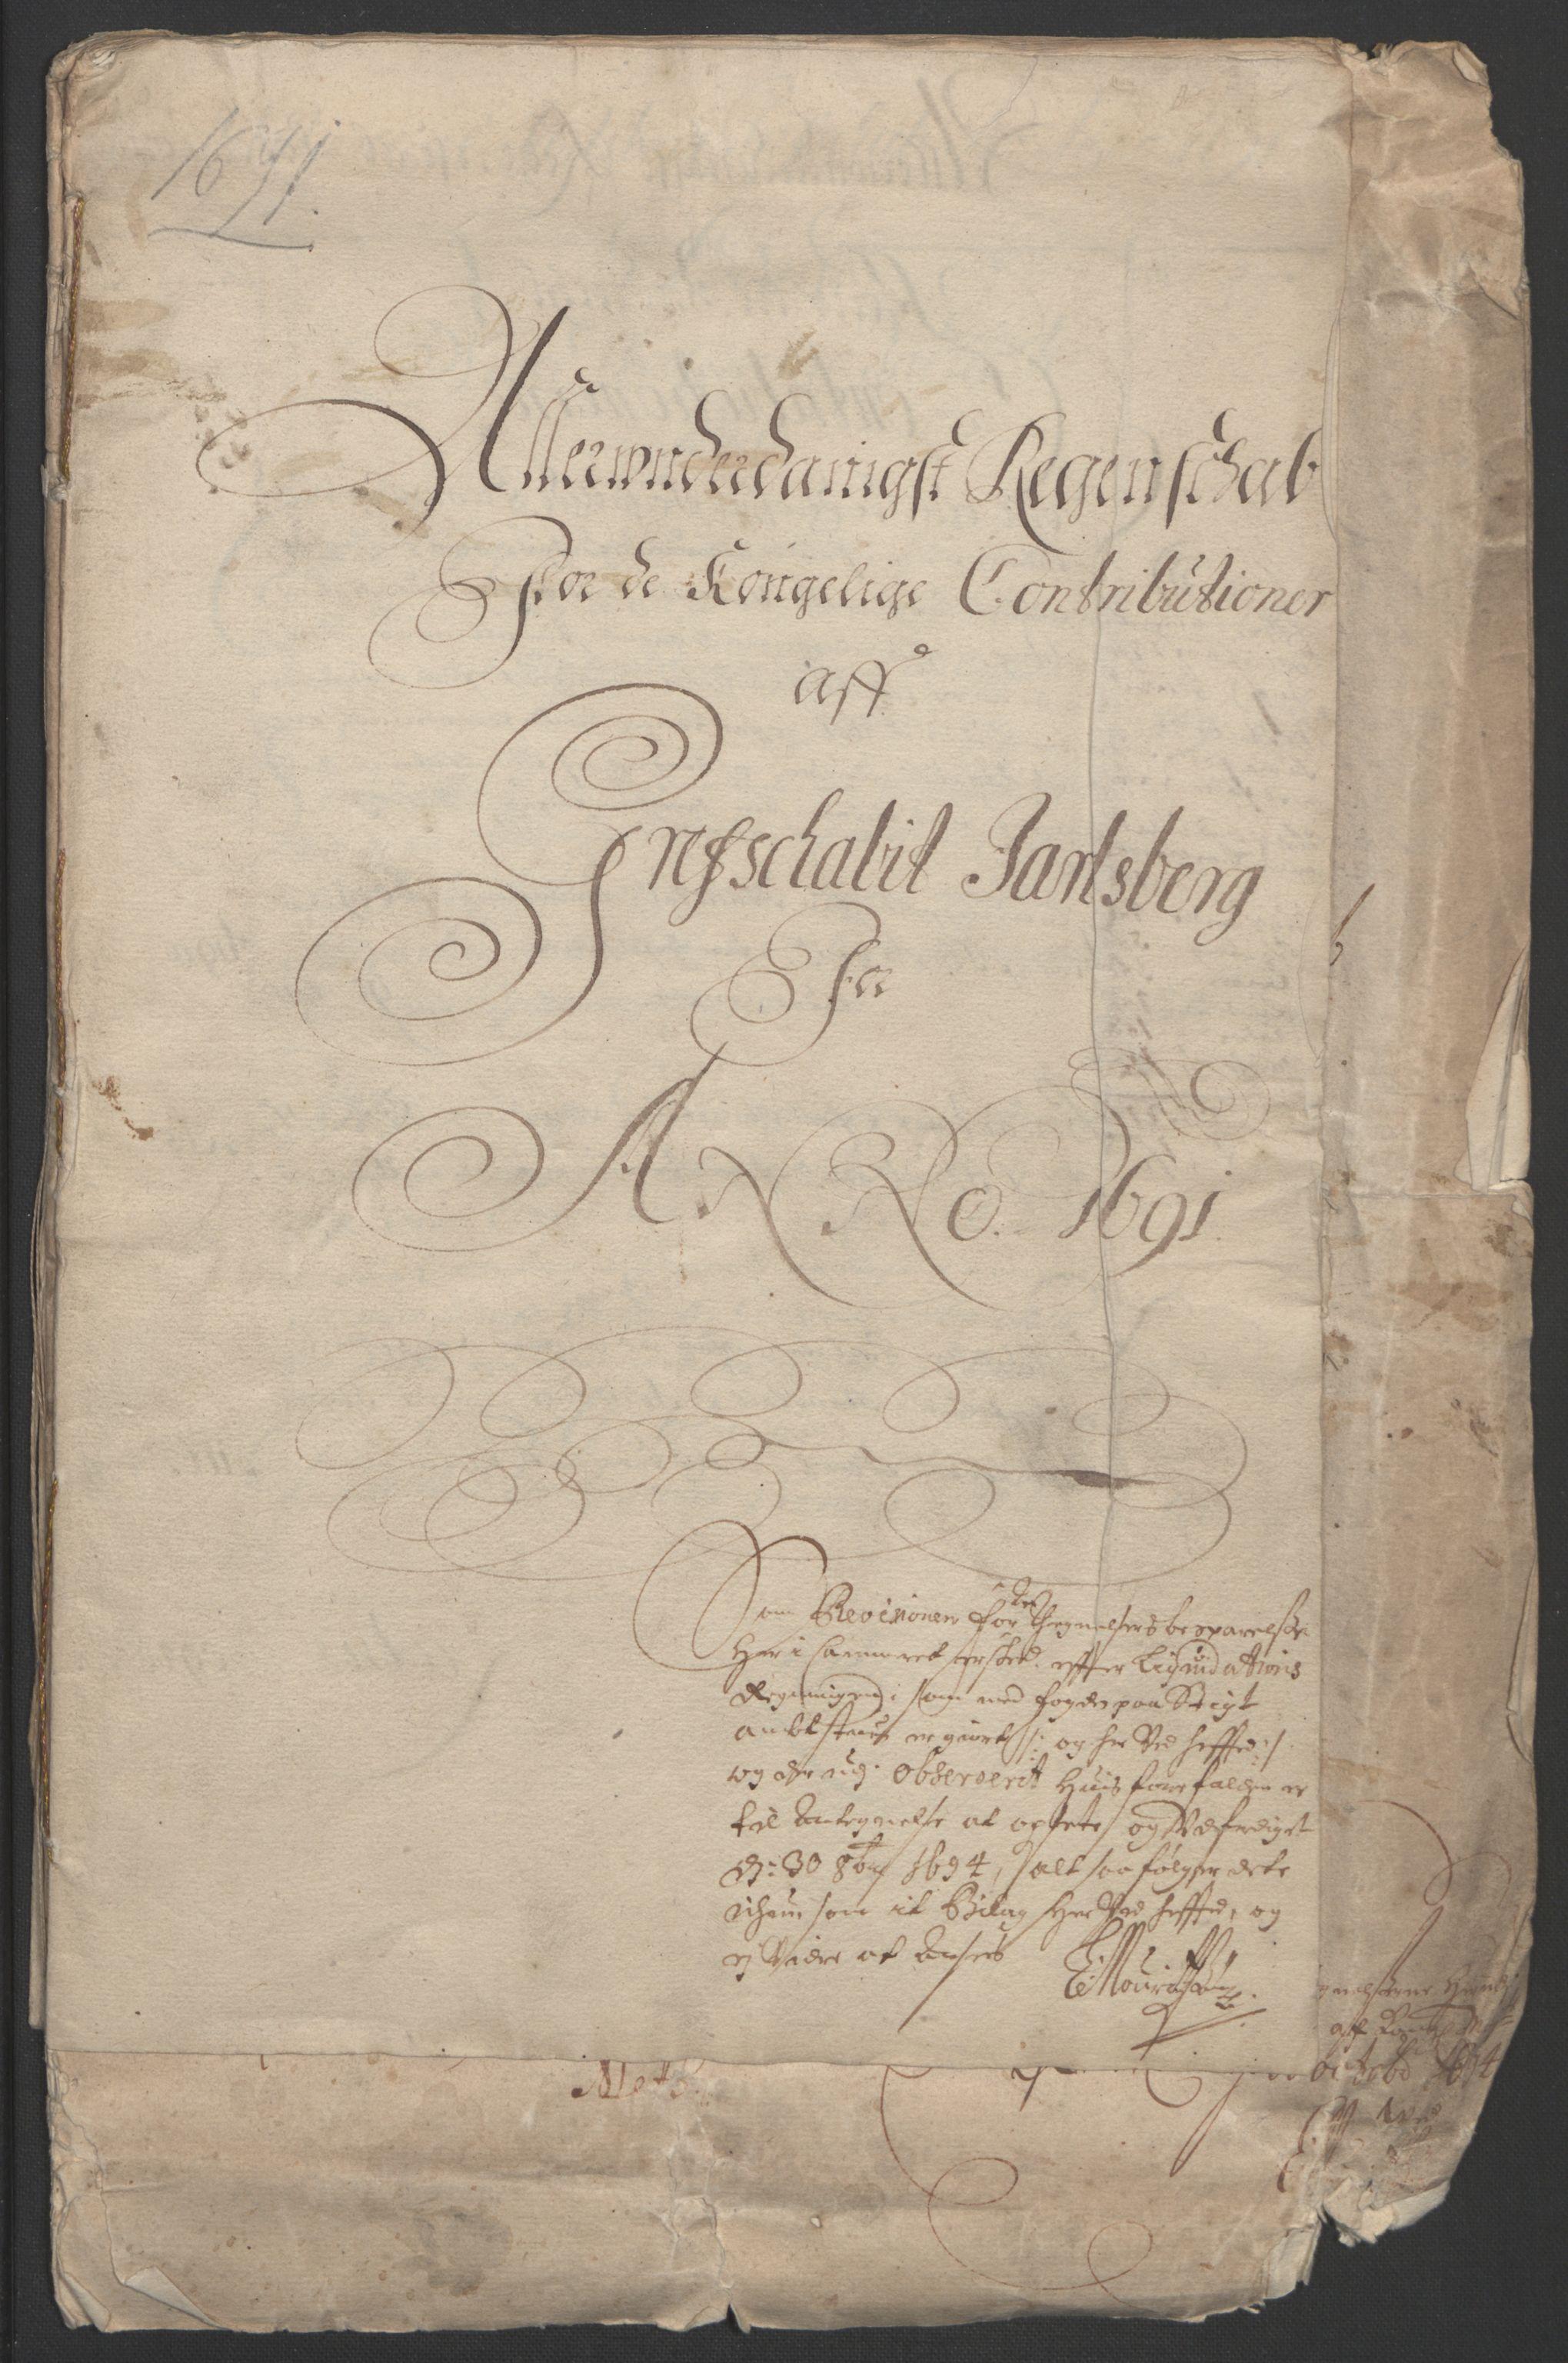 RA, Rentekammeret inntil 1814, Reviderte regnskaper, Fogderegnskap, R32/L1864: Fogderegnskap Jarlsberg grevskap, 1691, s. 3